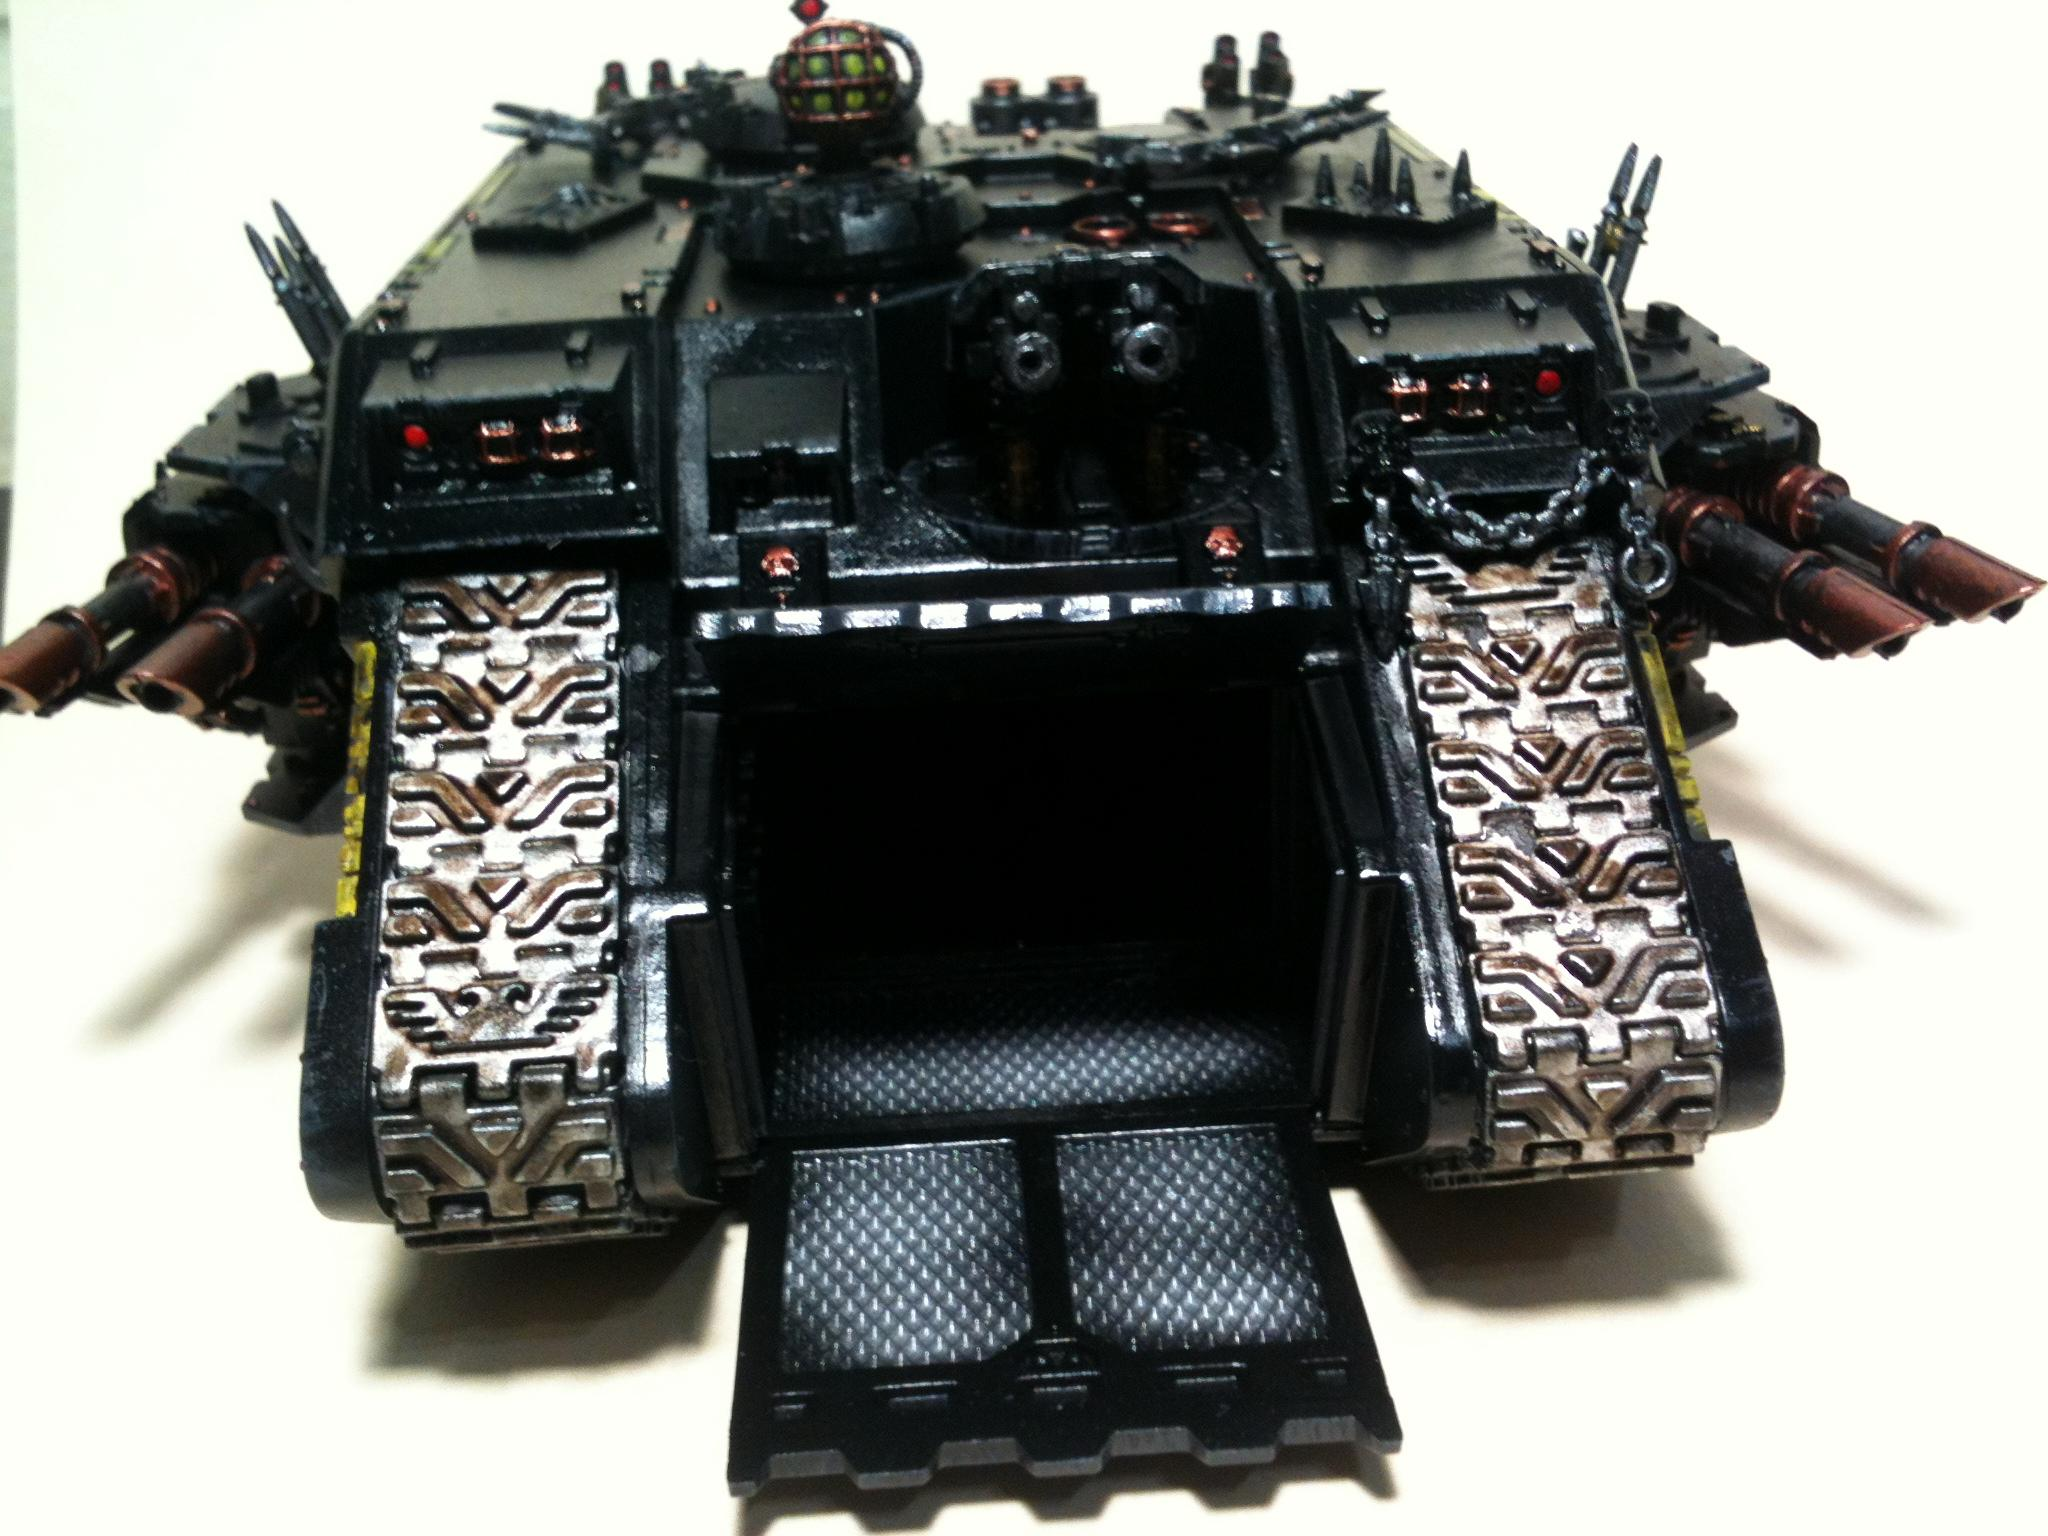 Black Legion, Chaos Space Marines, Land Raider